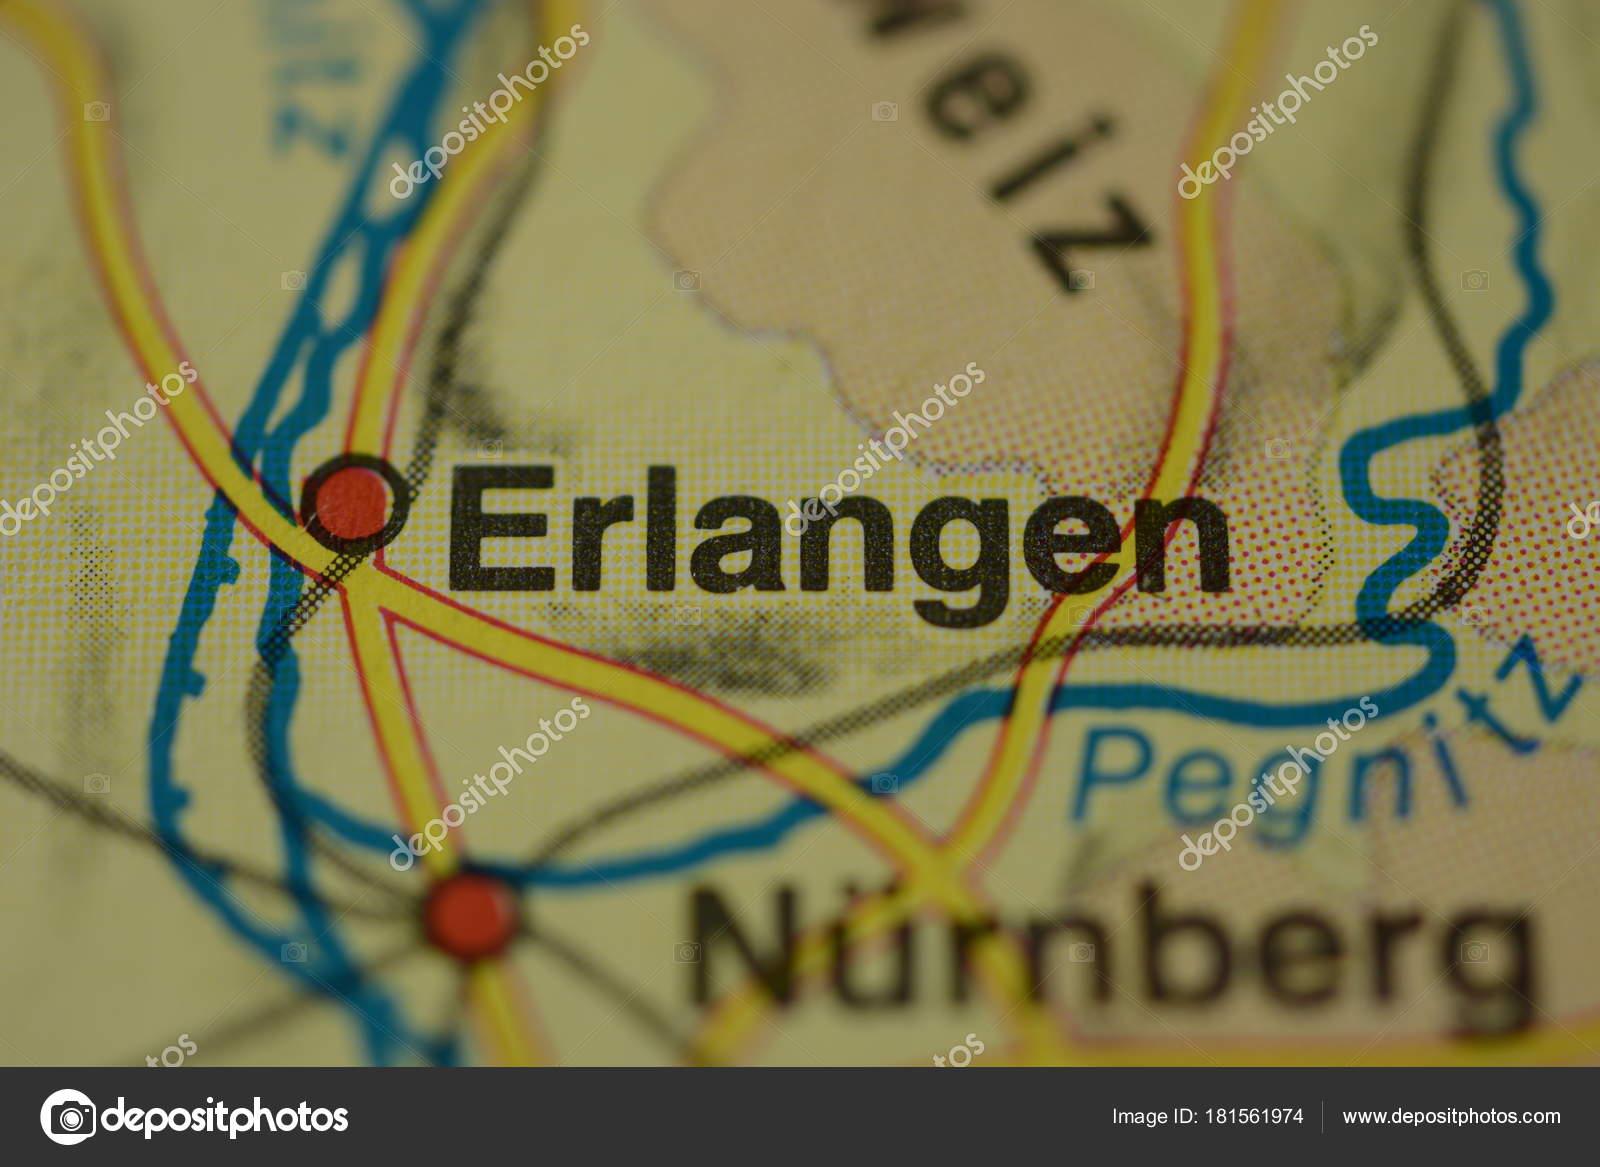 Map Of Germany Erlangen.City Name Erlangen Nuremberg Germany Map Stock Photo